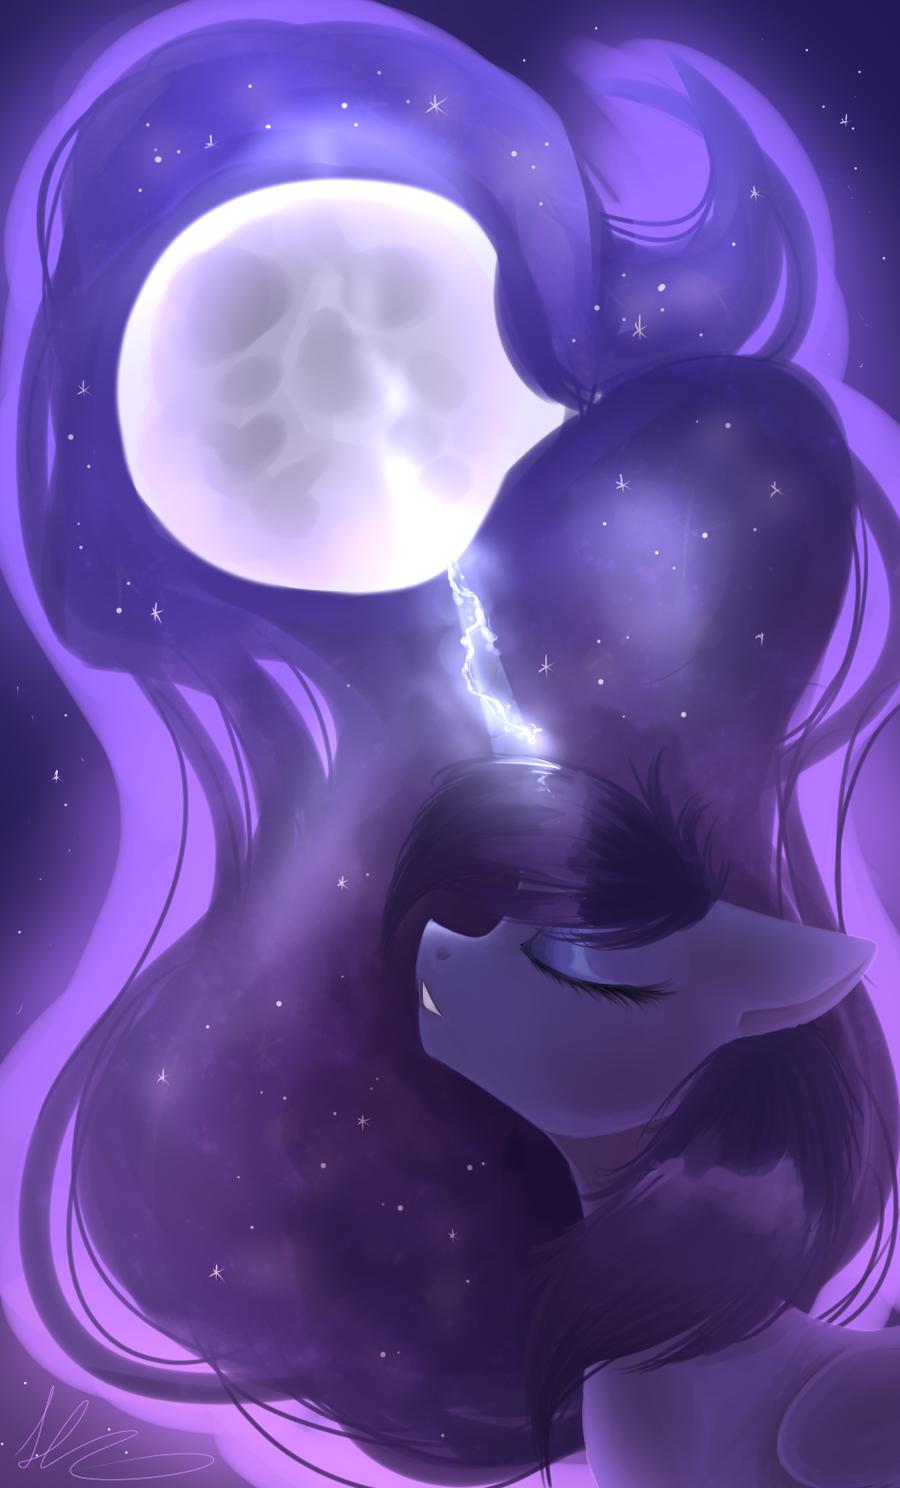 Luna by HarmoniousRain.deviantart.com on @deviantART